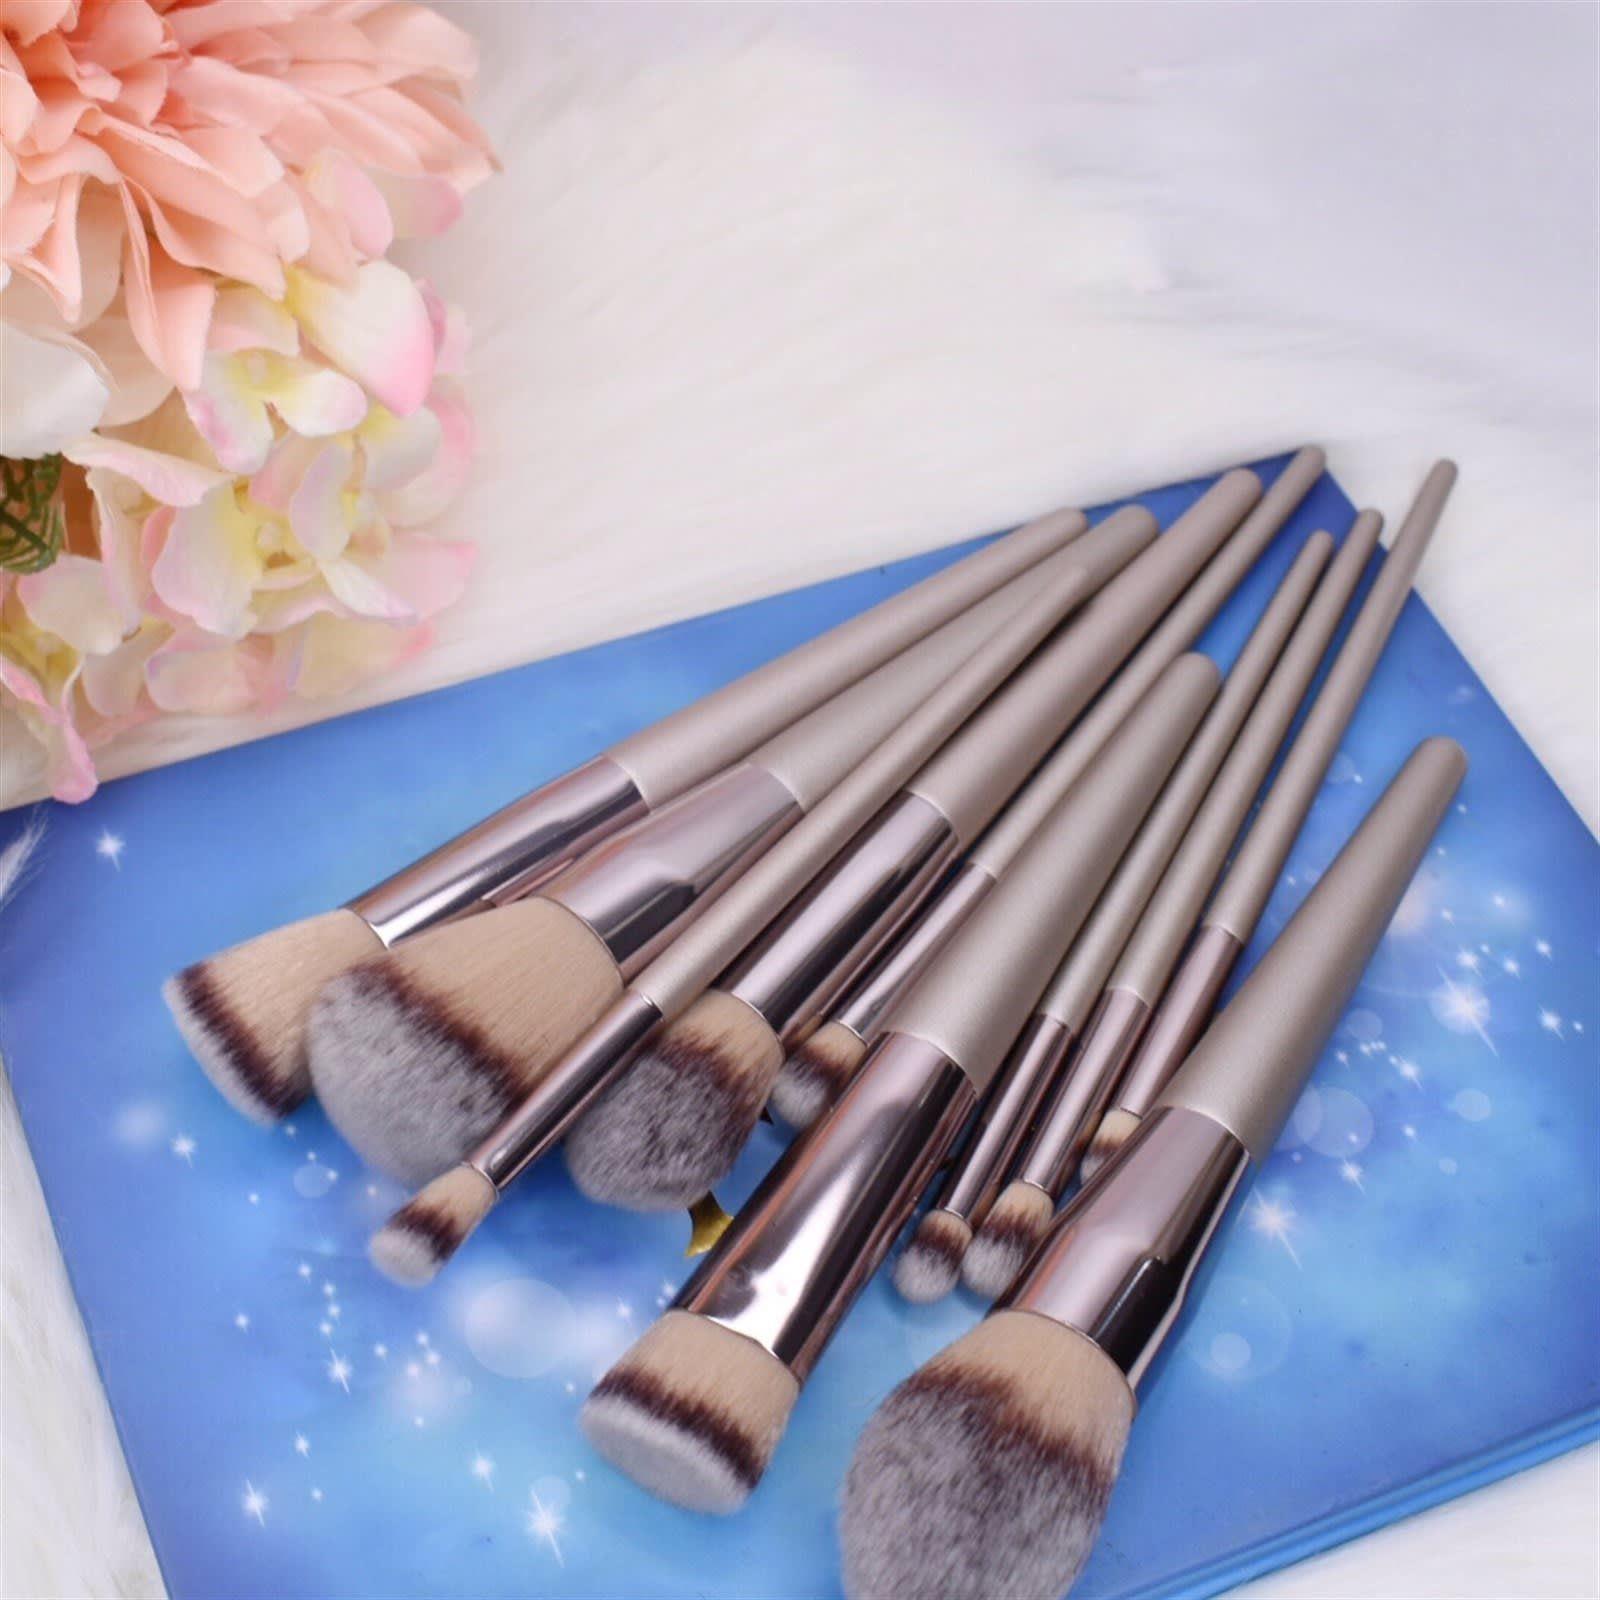 Professional Makeup Brushes Set of 10 Sprinkle Savings